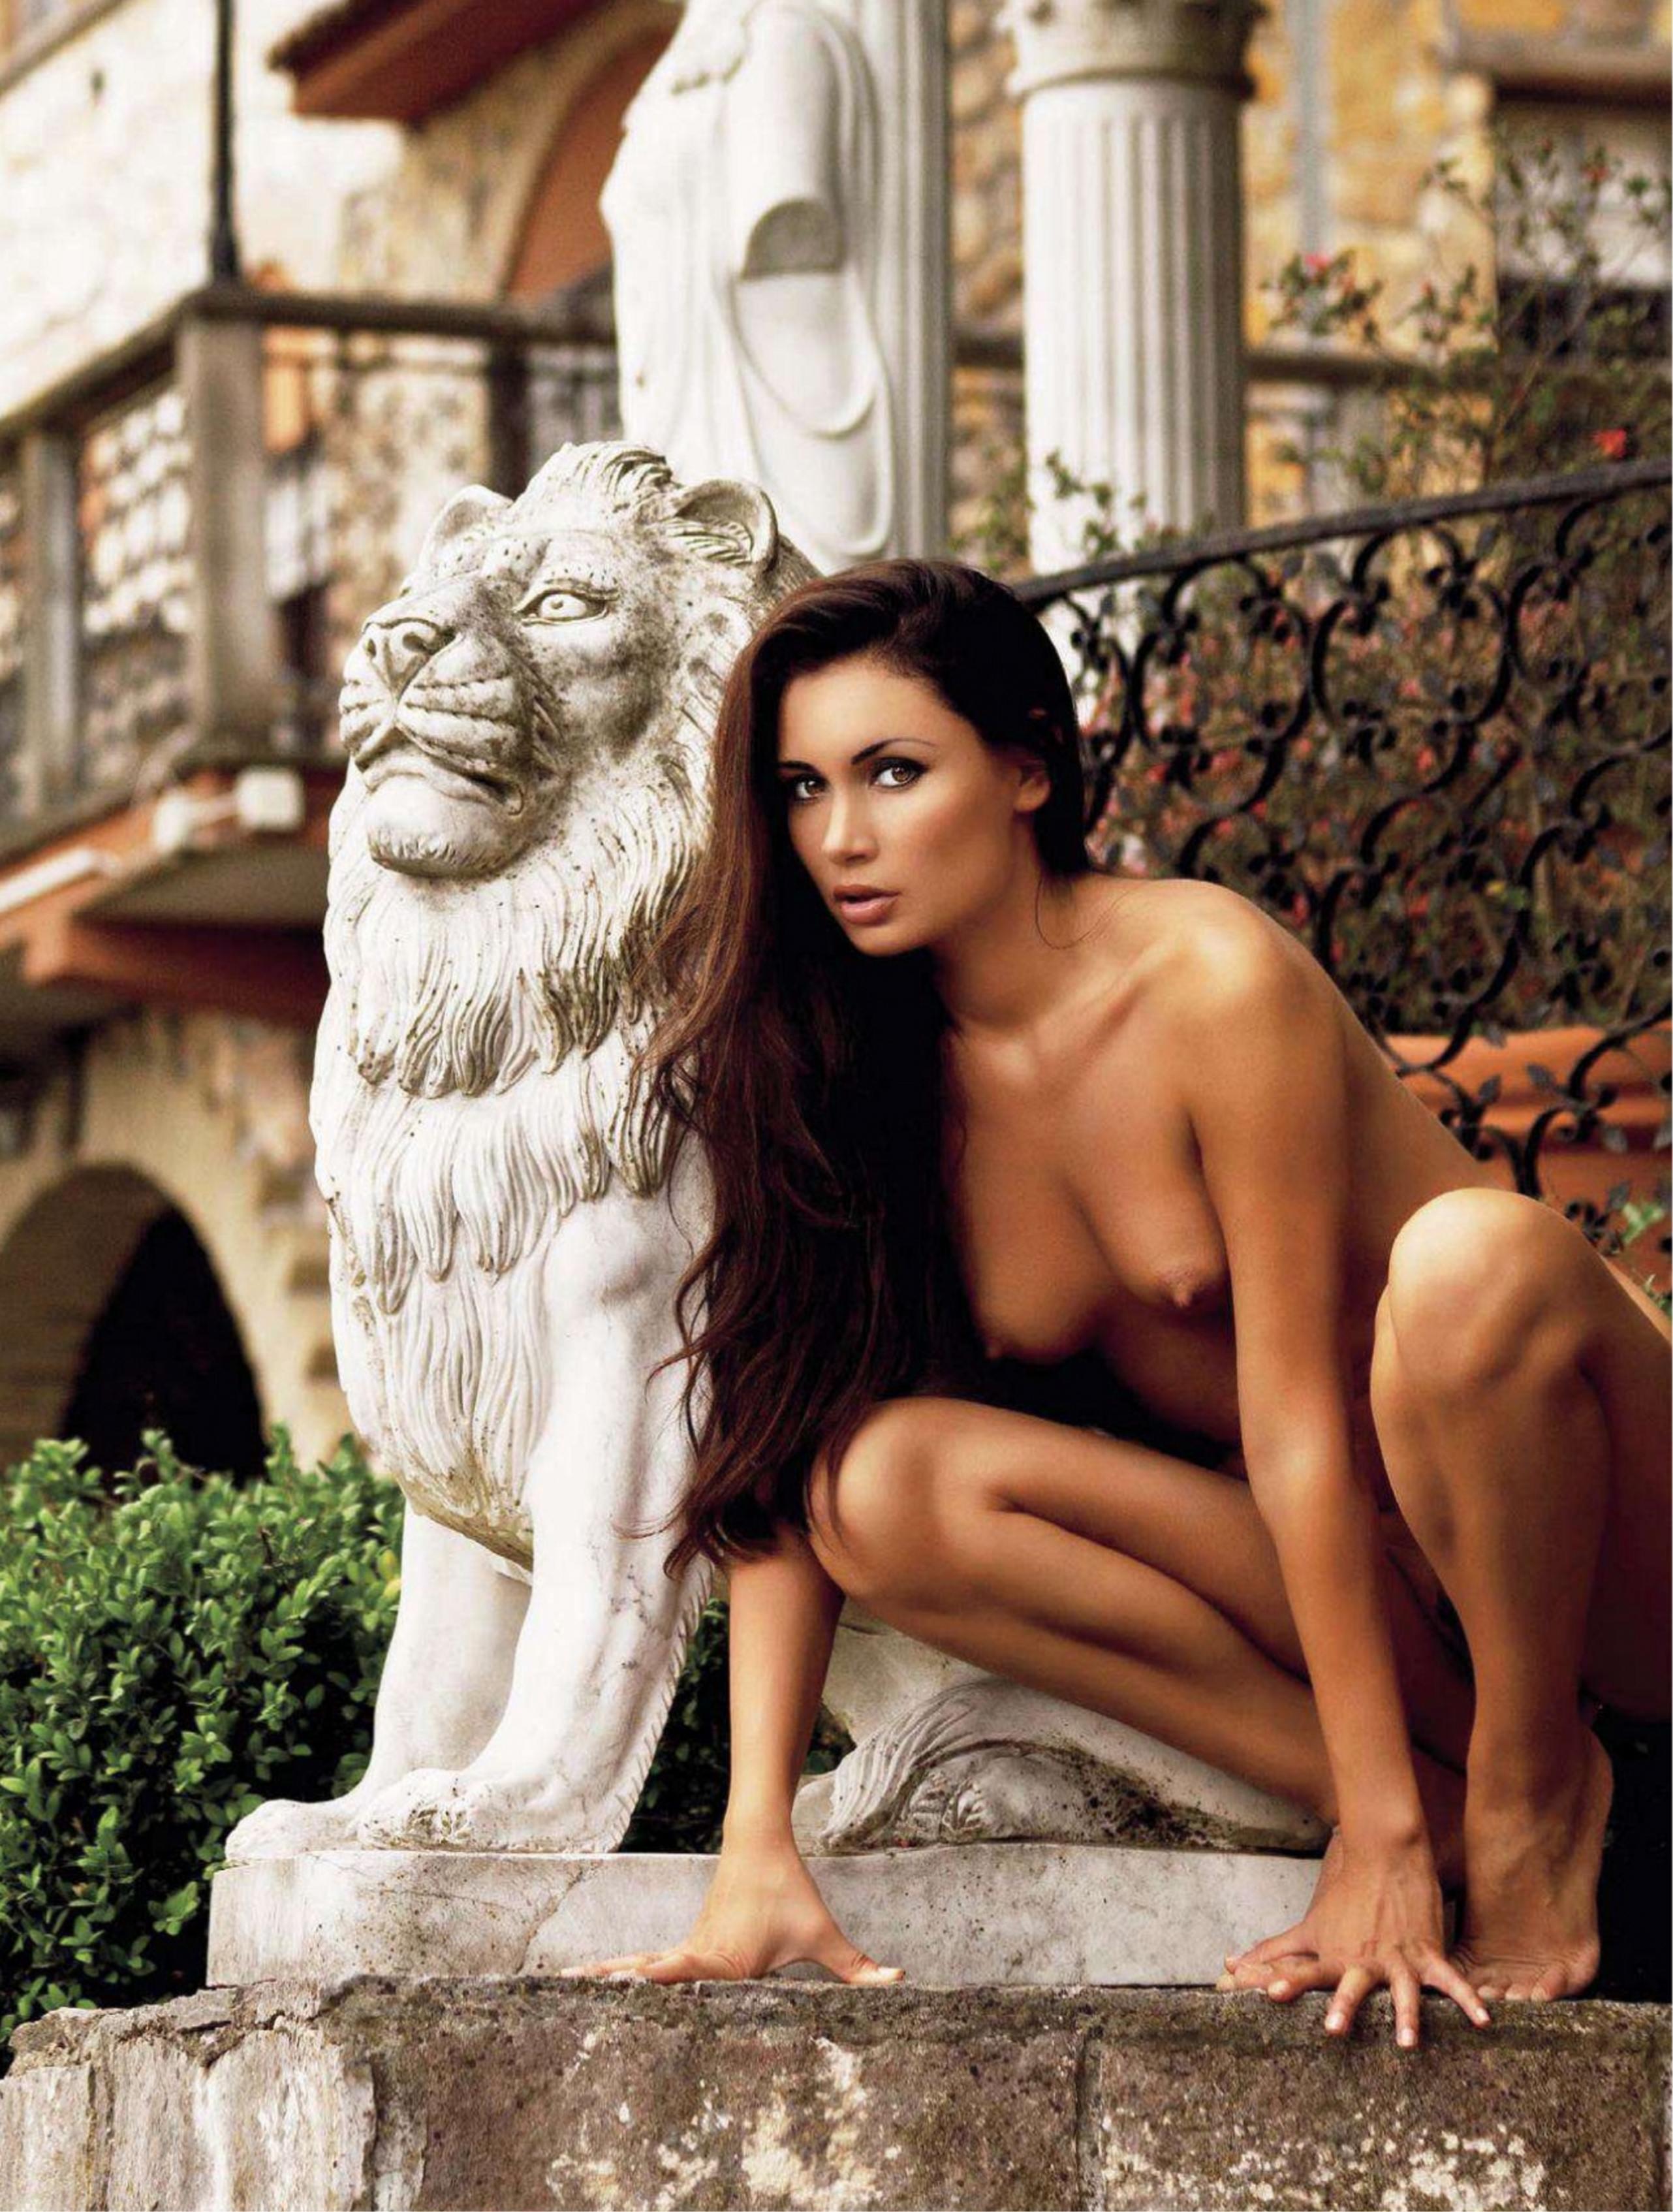 441816233_Playboy_2_2012_Croatia_Scanof.net_042_123_534lo.jpg